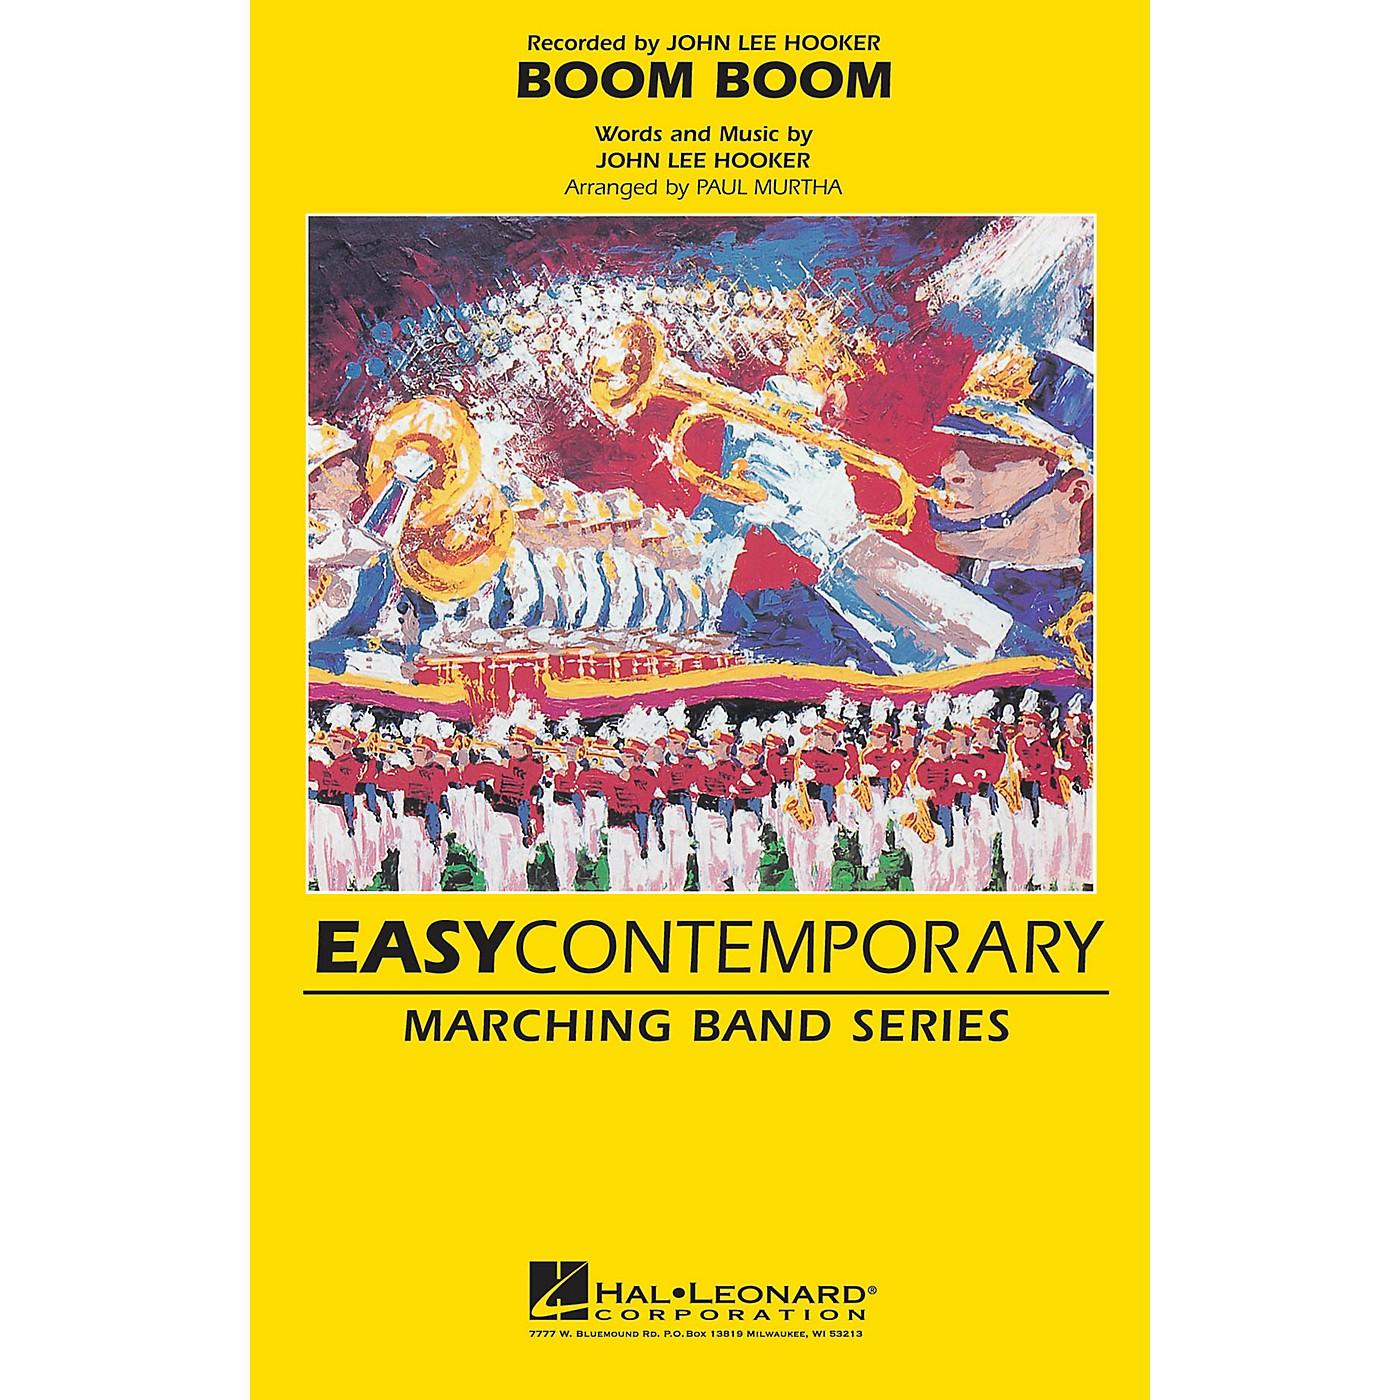 Hal Leonard Boom Boom Marching Band Level 2 Arranged by Paul Murtha thumbnail